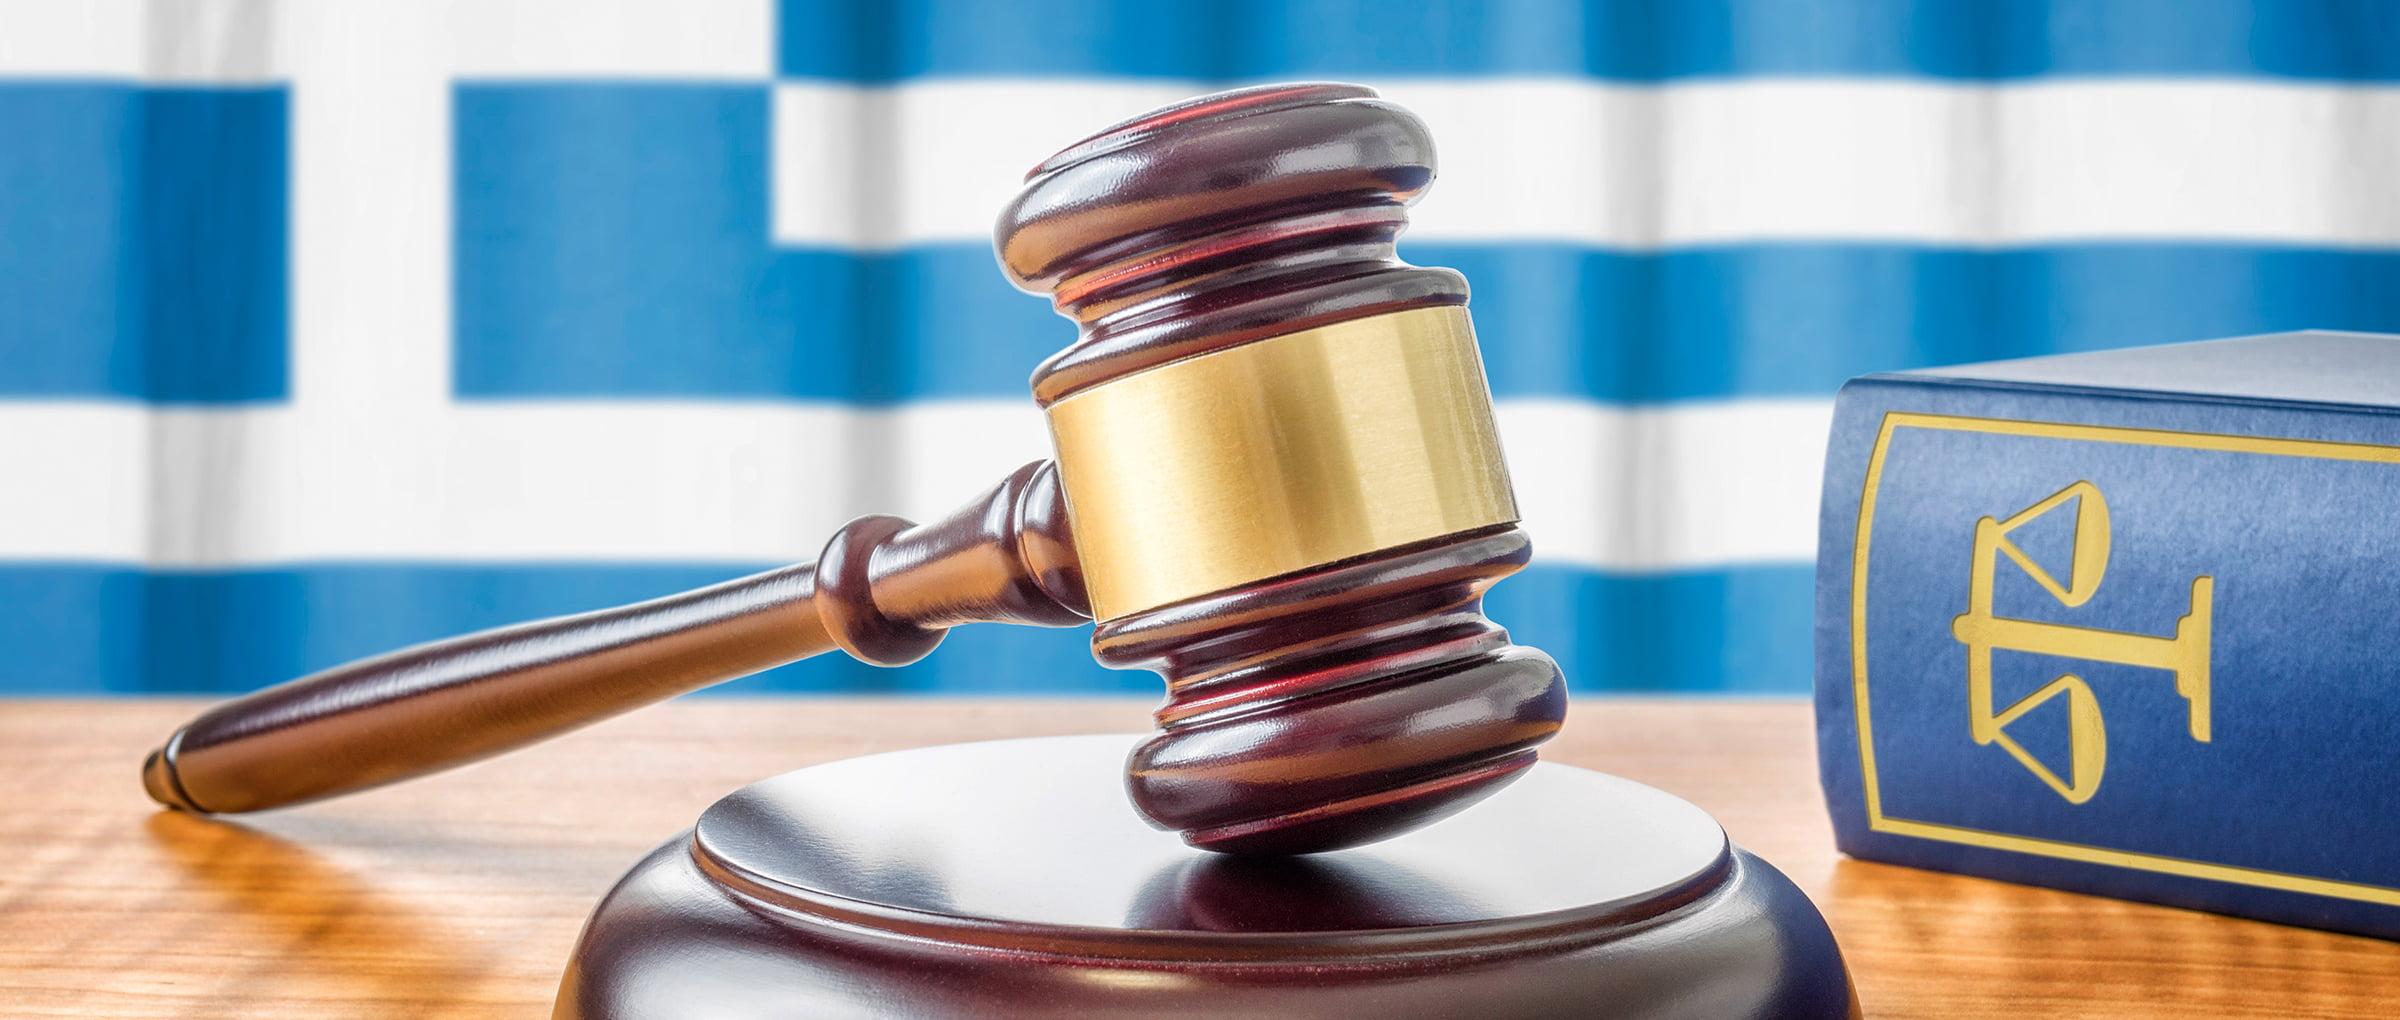 Législation en Grèce